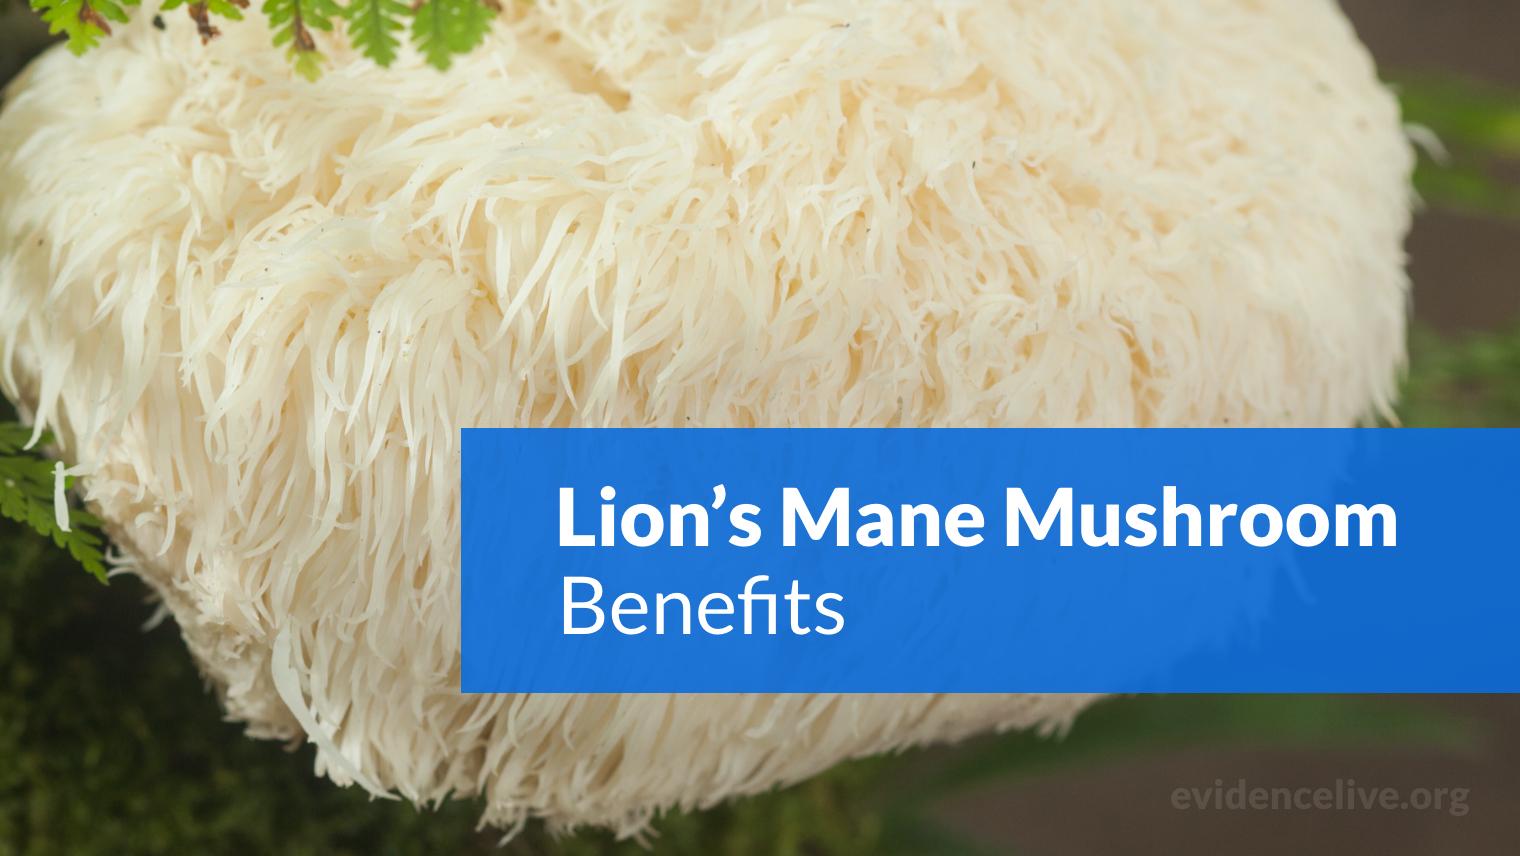 Lion's Mane Mushroom Benefits: Is It Good For Your Brain?